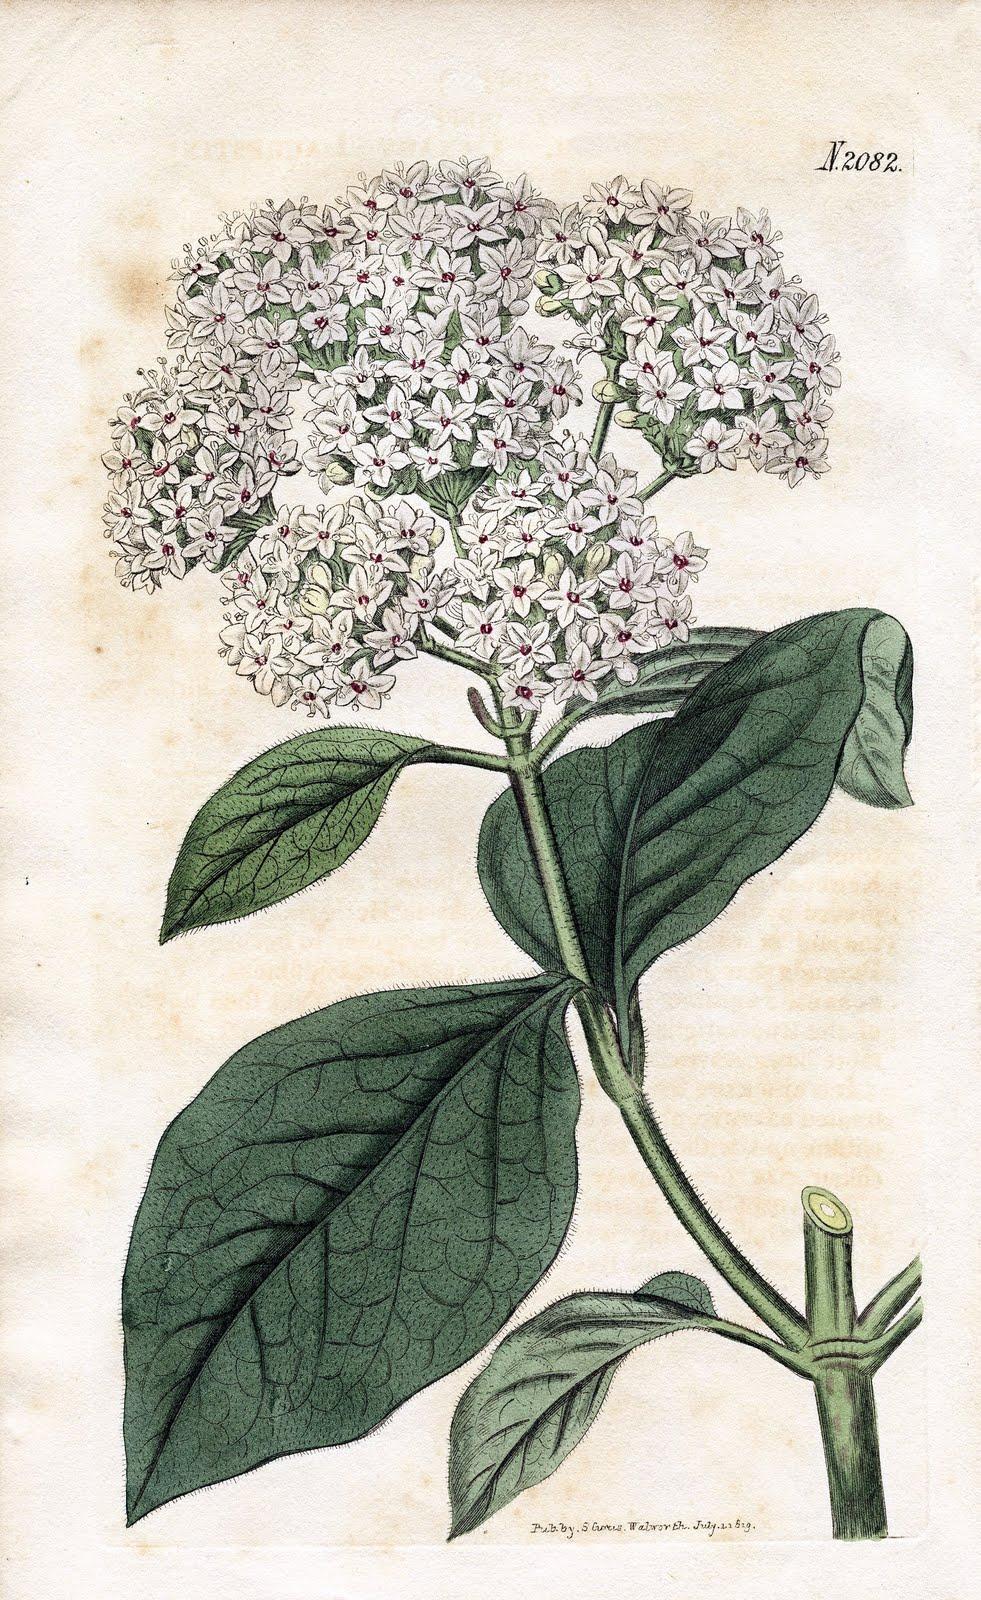 Lovely Antique Botanical Graphic - Viburnum - The Graphics ...